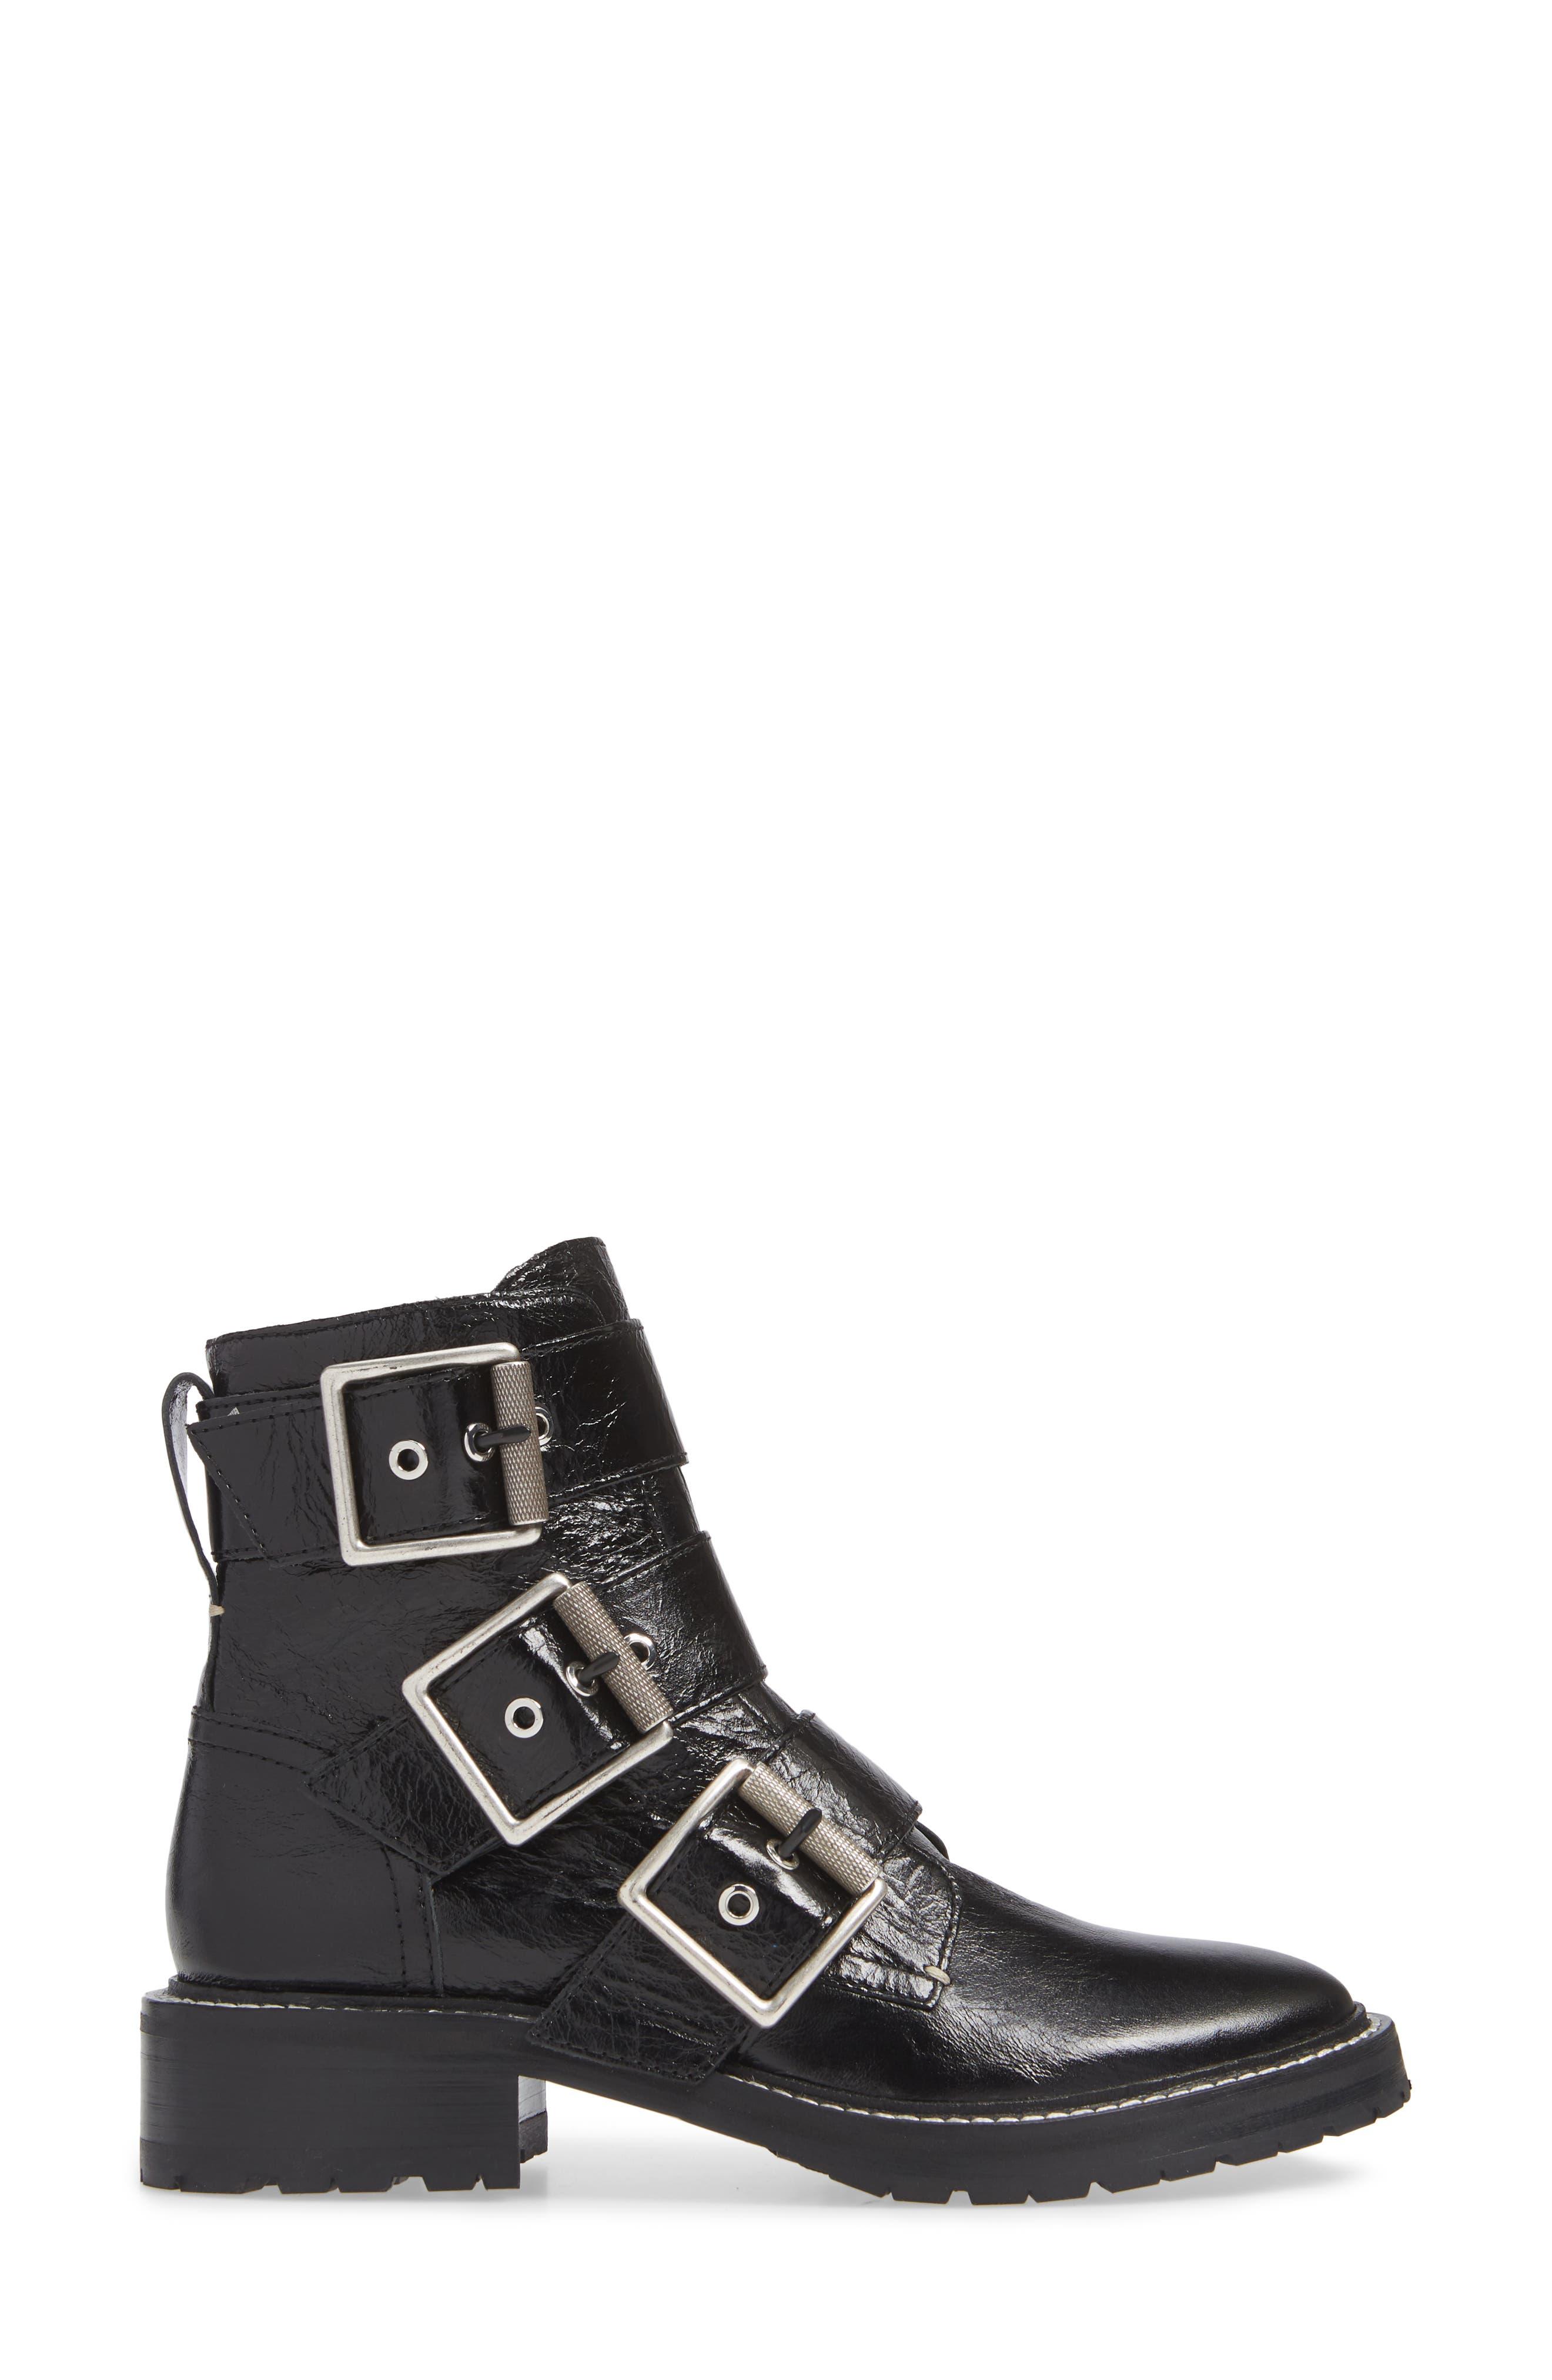 RAG & BONE, Cannon Buckle Moto Boot, Alternate thumbnail 3, color, BLACK